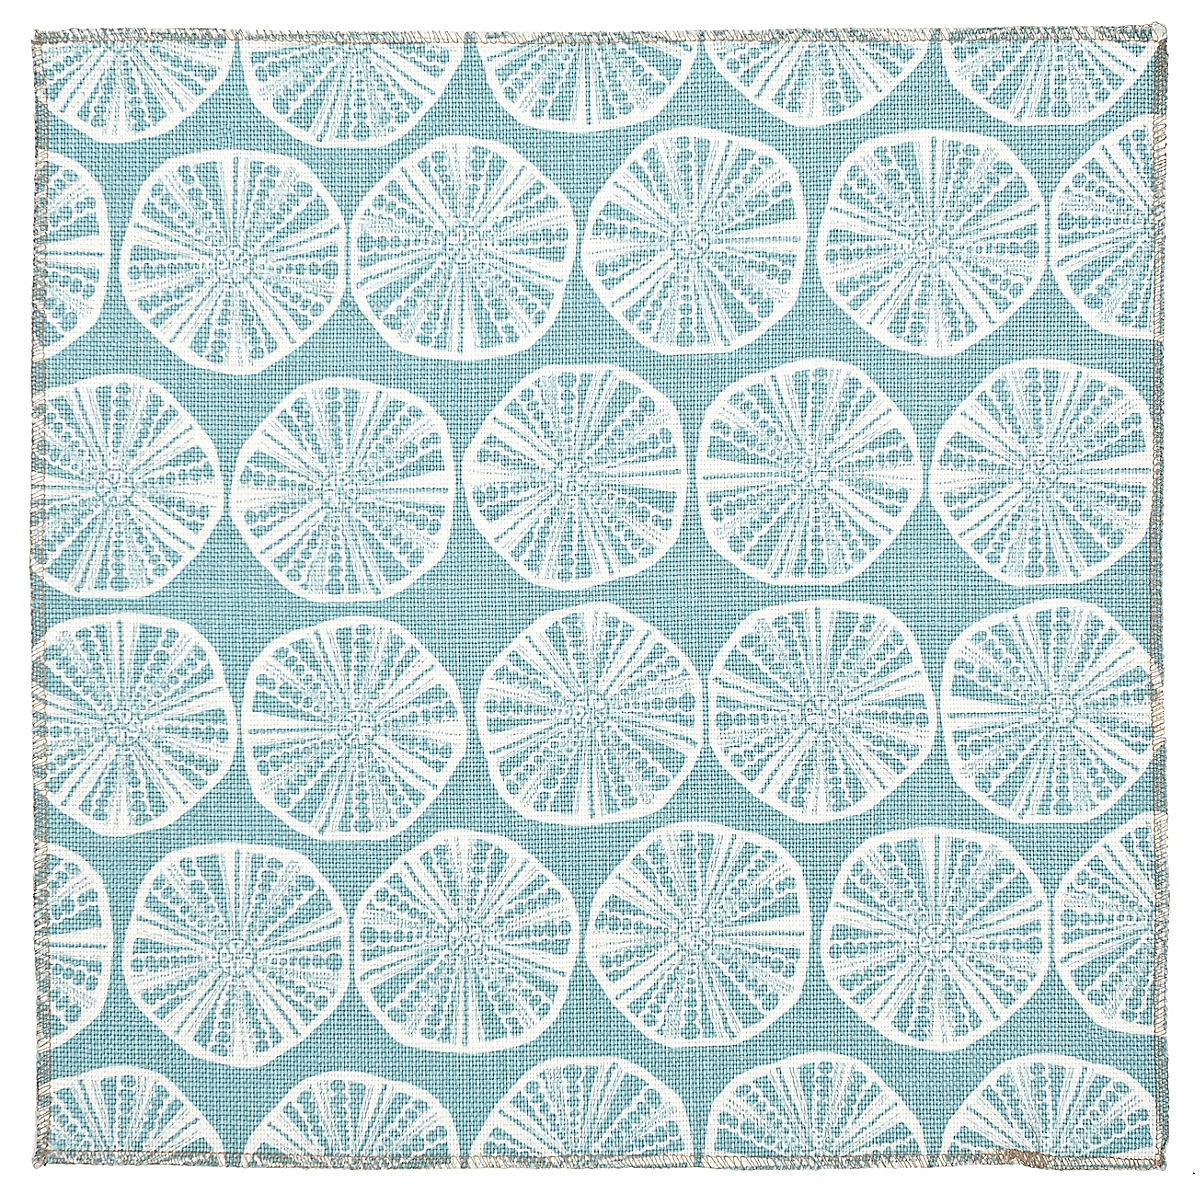 Sea Biscuit: Porch (fabric yardage)